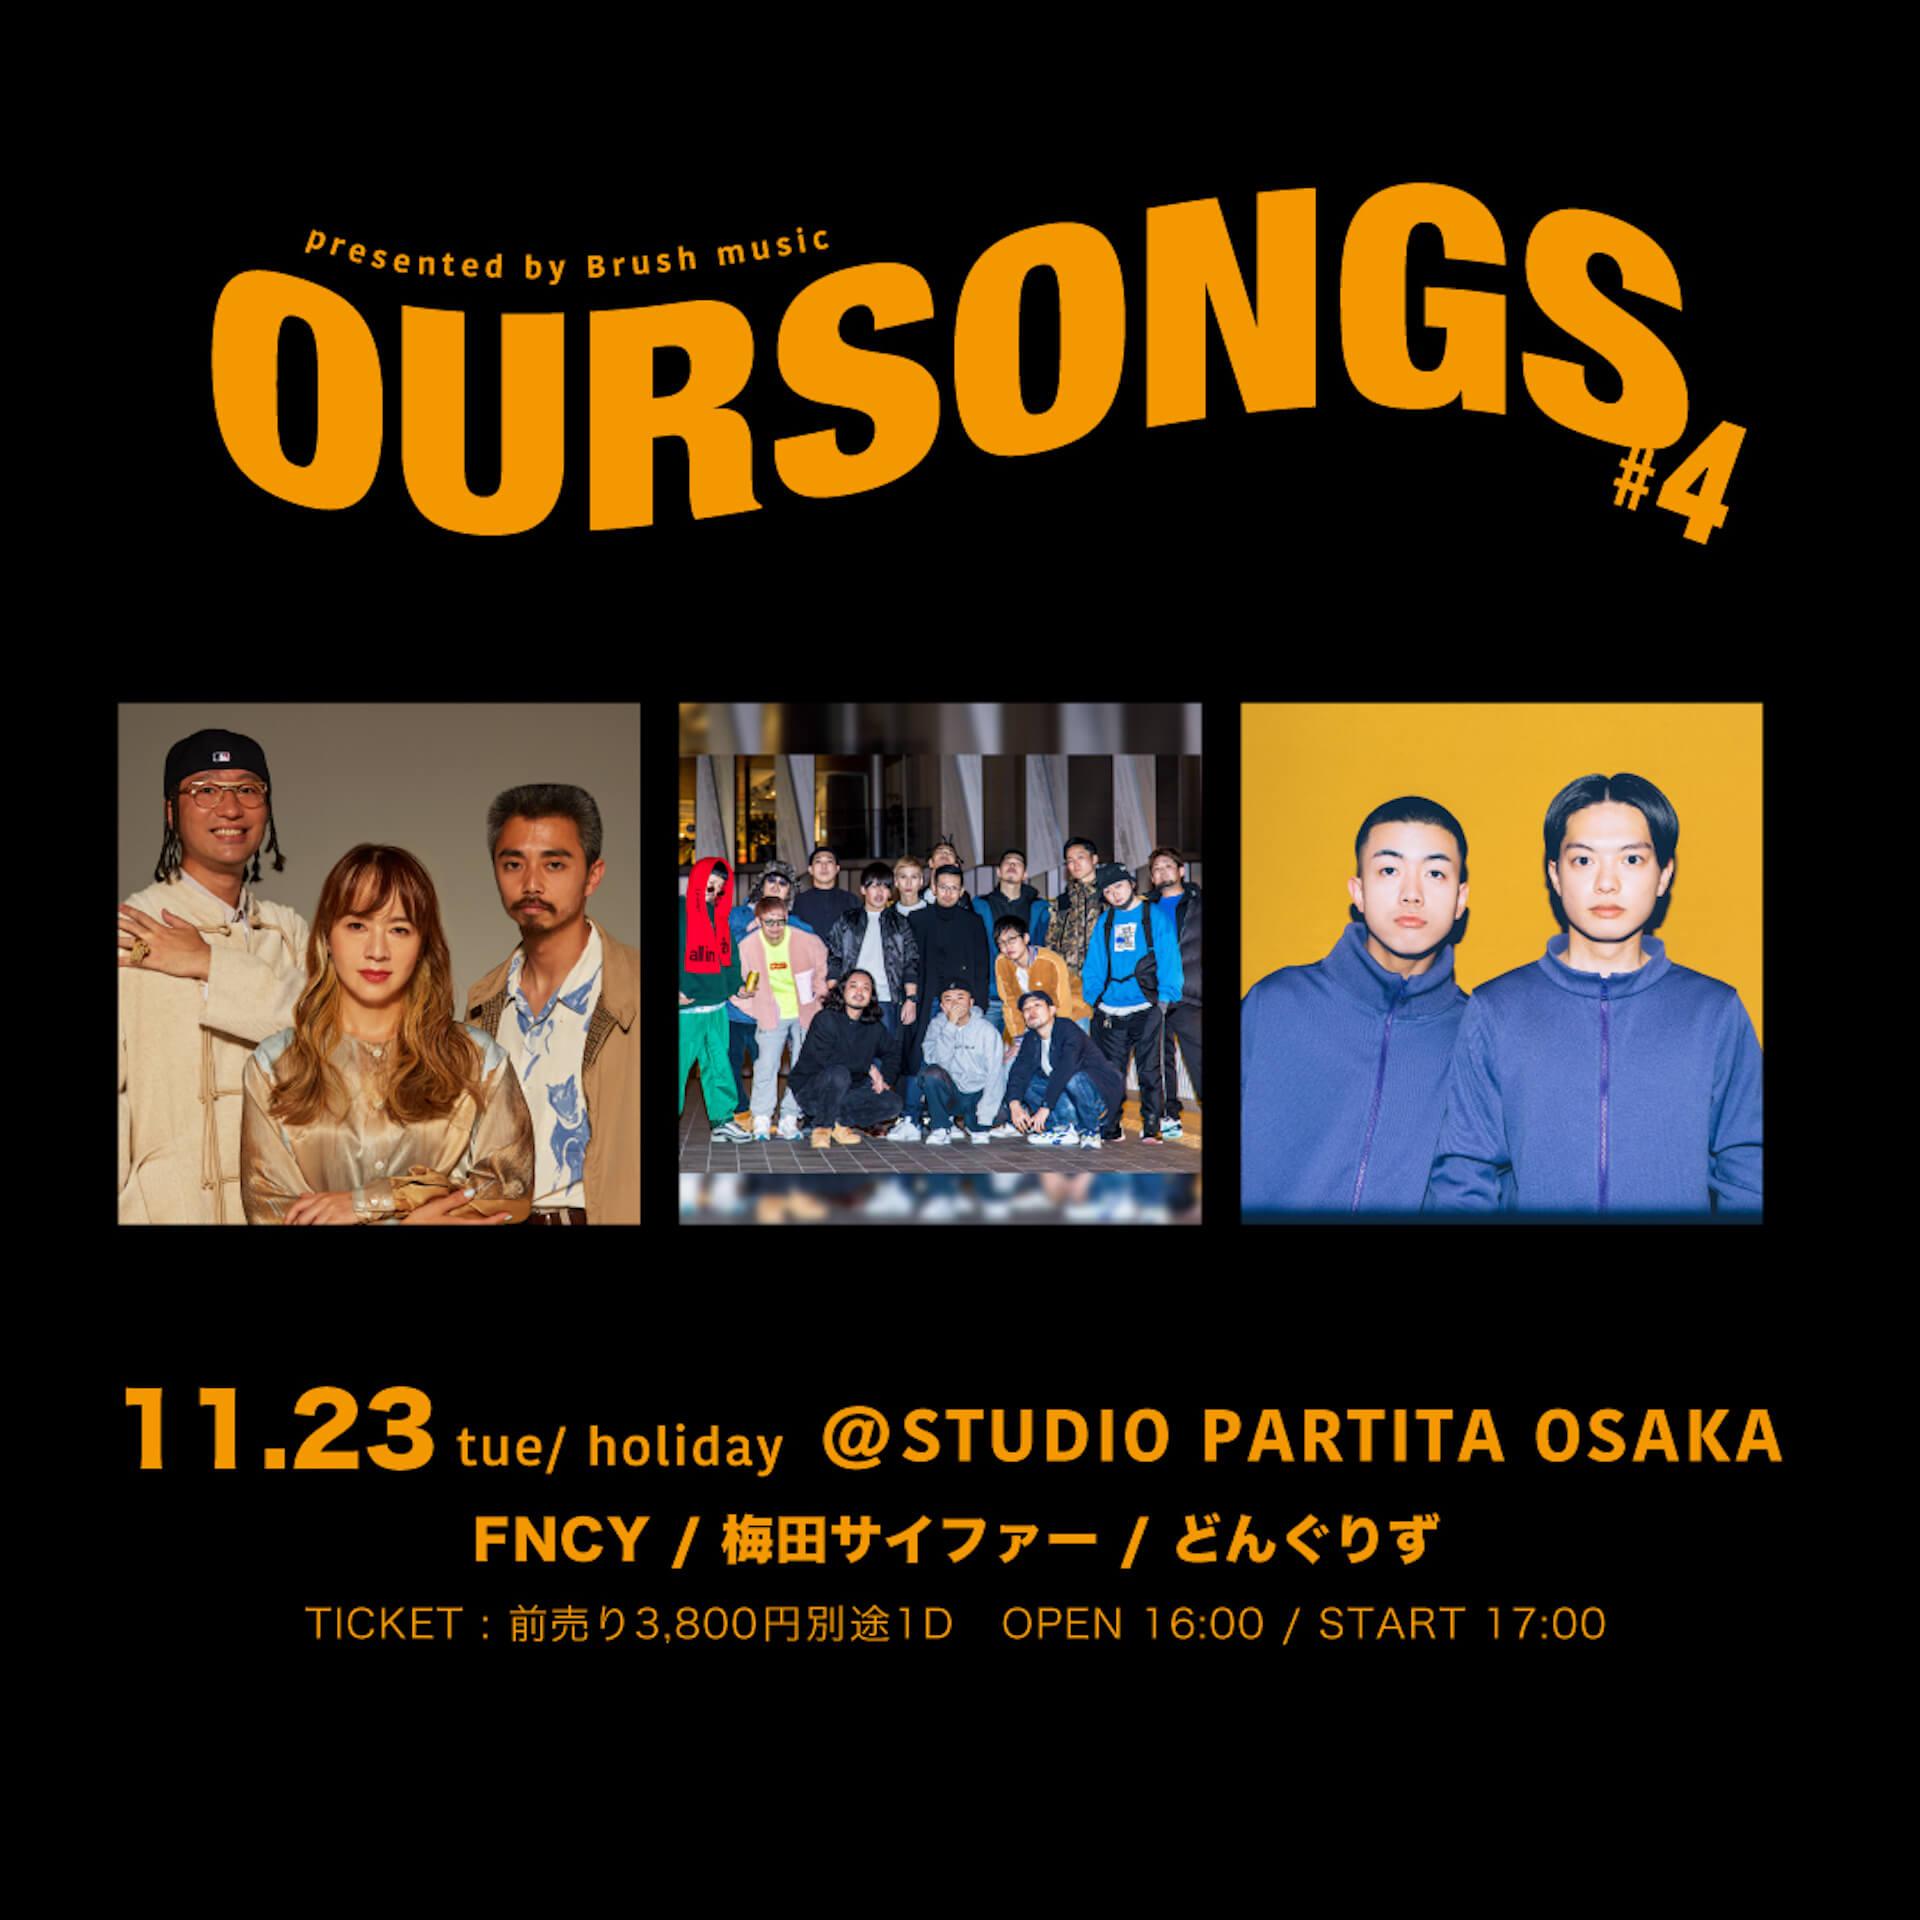 <OURSONGS #4>が大阪名村造船所跡地にて開催が決定!梅田サイファー、FNCY、どんぐりずによるスリーマン music211012_oursongs_01